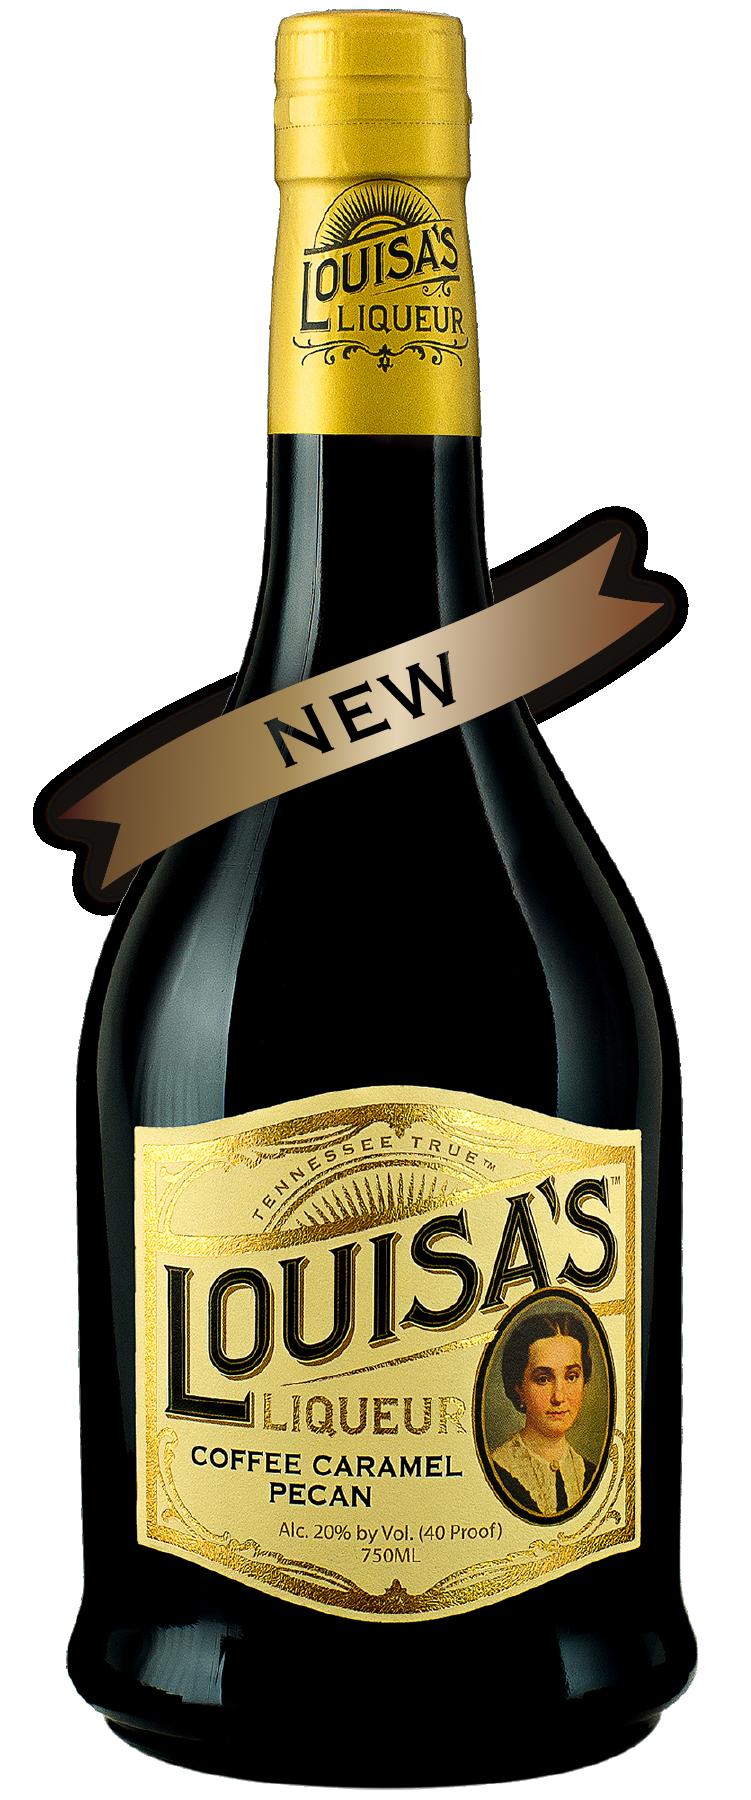 Nelson's Green Brier Distillery's Louisa's Liqueur